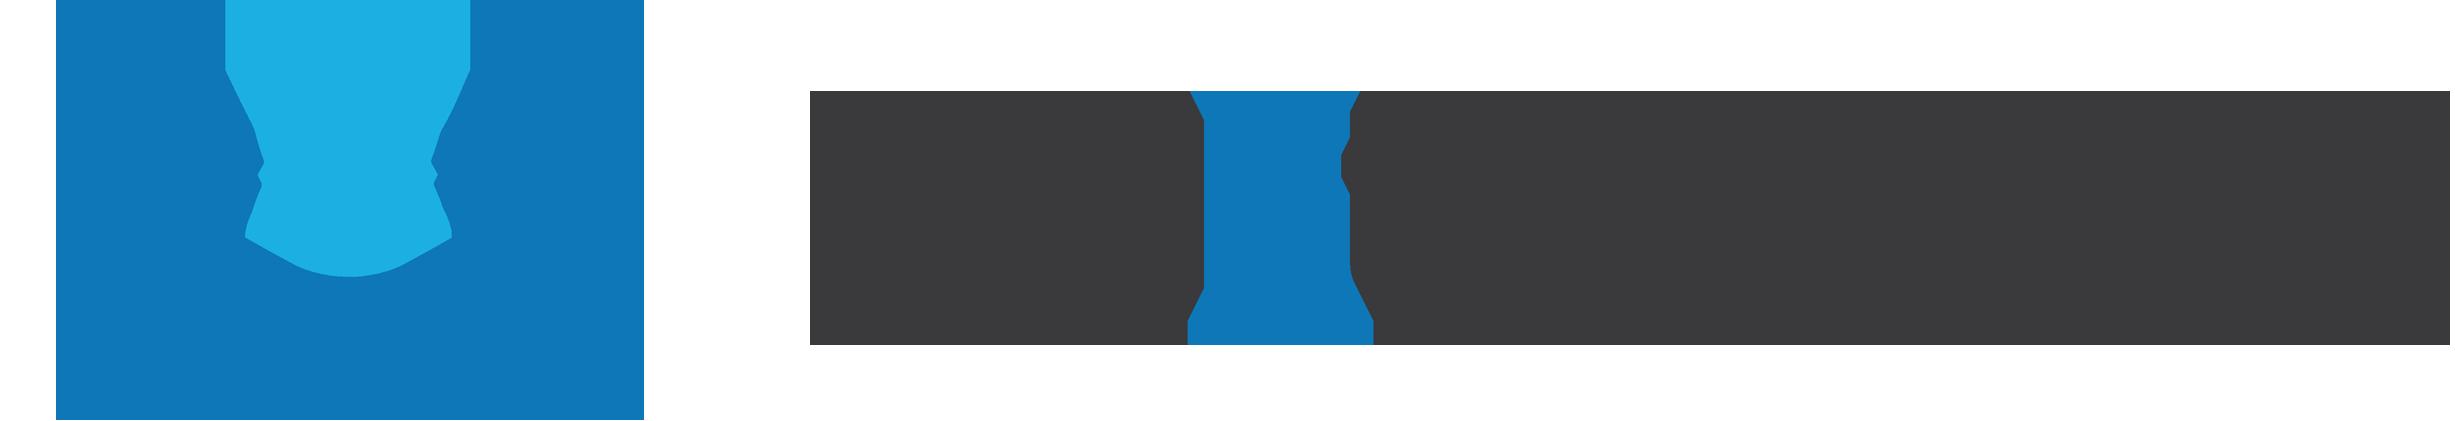 IFI Training Logo (wide).png